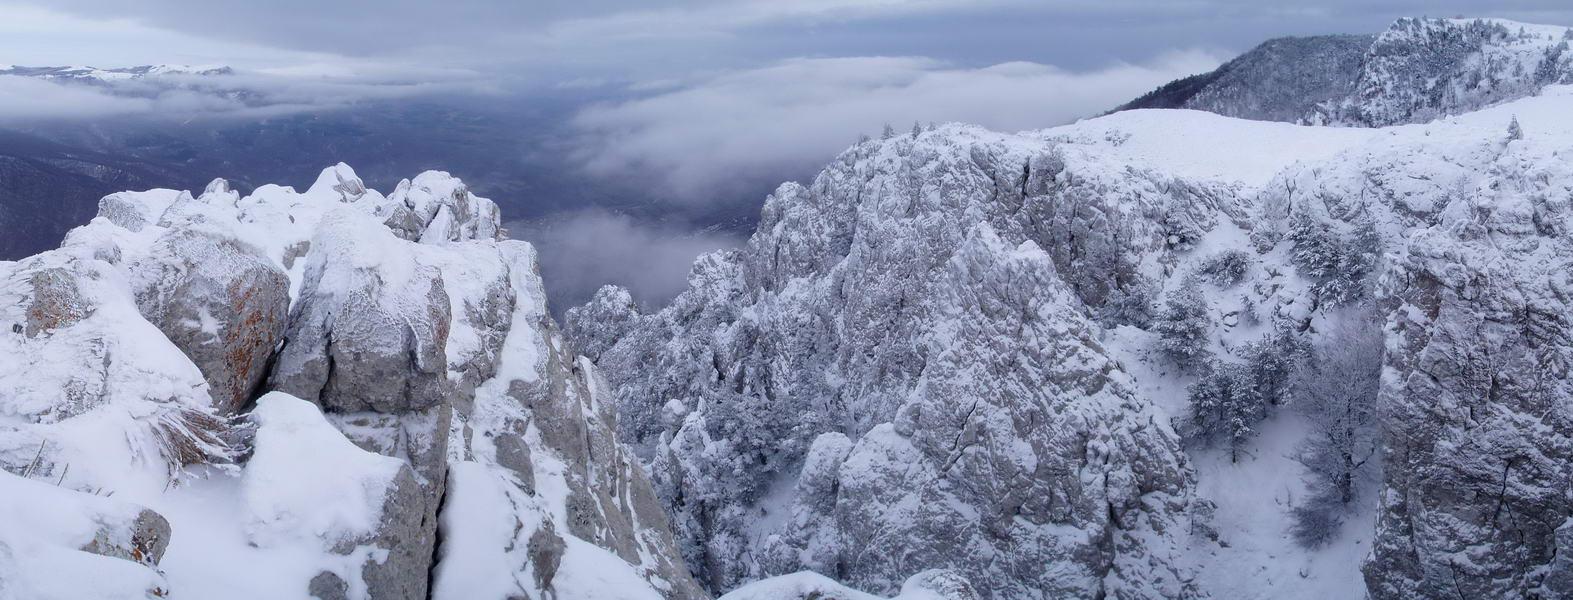 Заснеженная вершина Демерджи